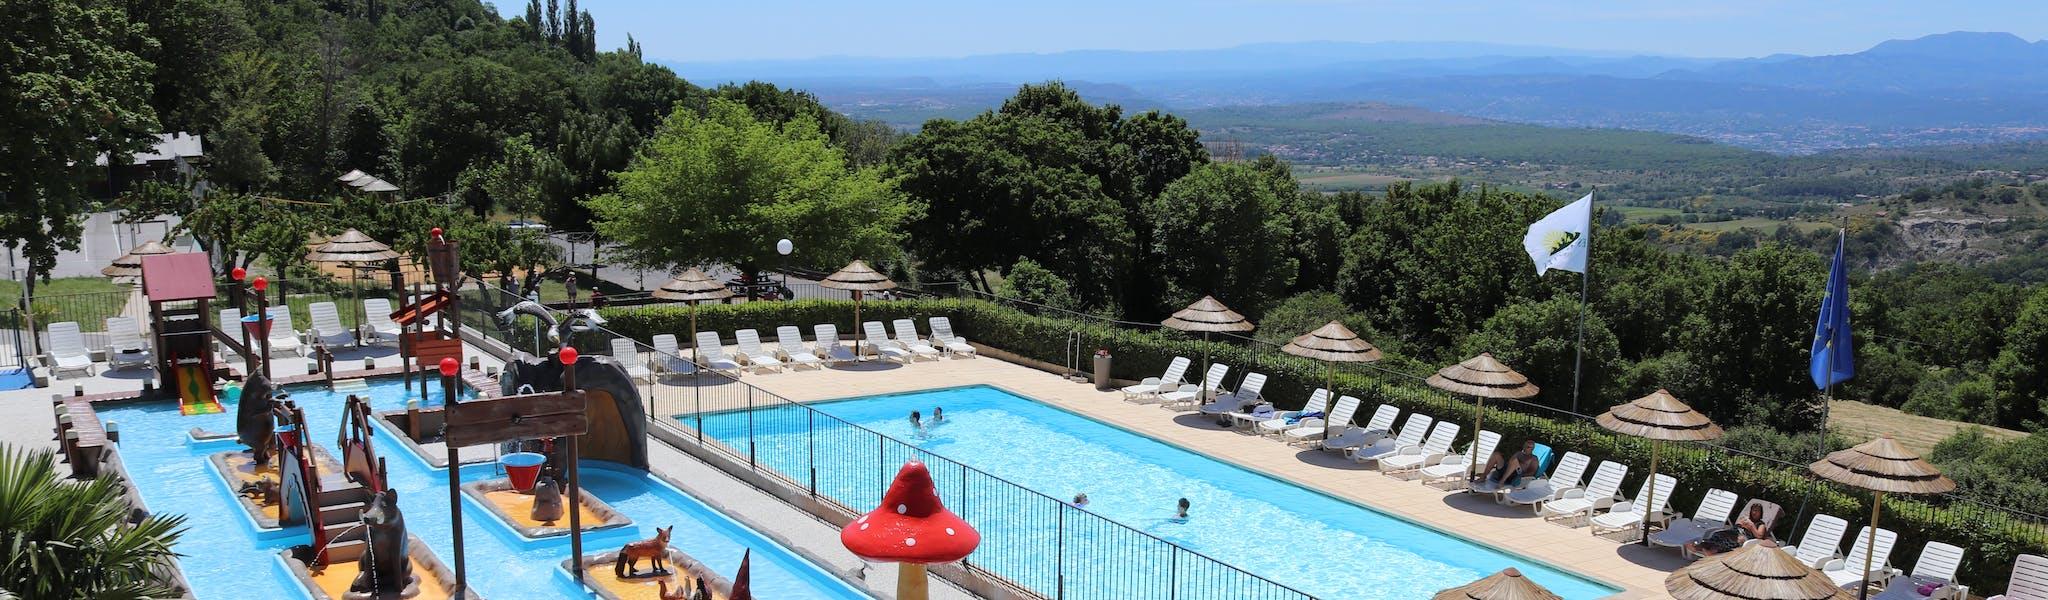 Camping Les Charmilles zwembad overzicht